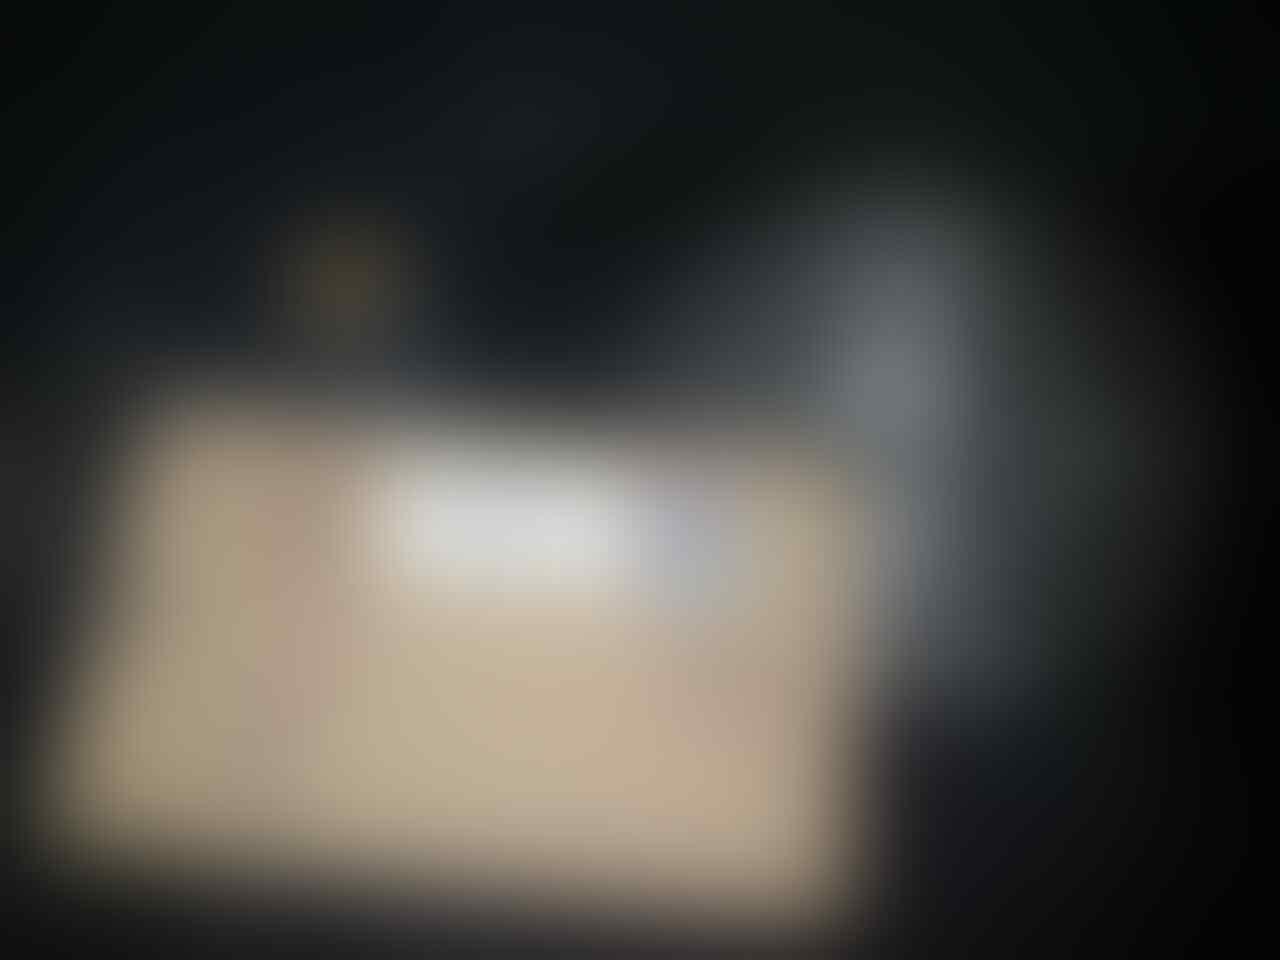 Celana Pendek Petersaysdenim (PSD) TREMOLO ARM BARU gress DIJAMIN ASLI size 26